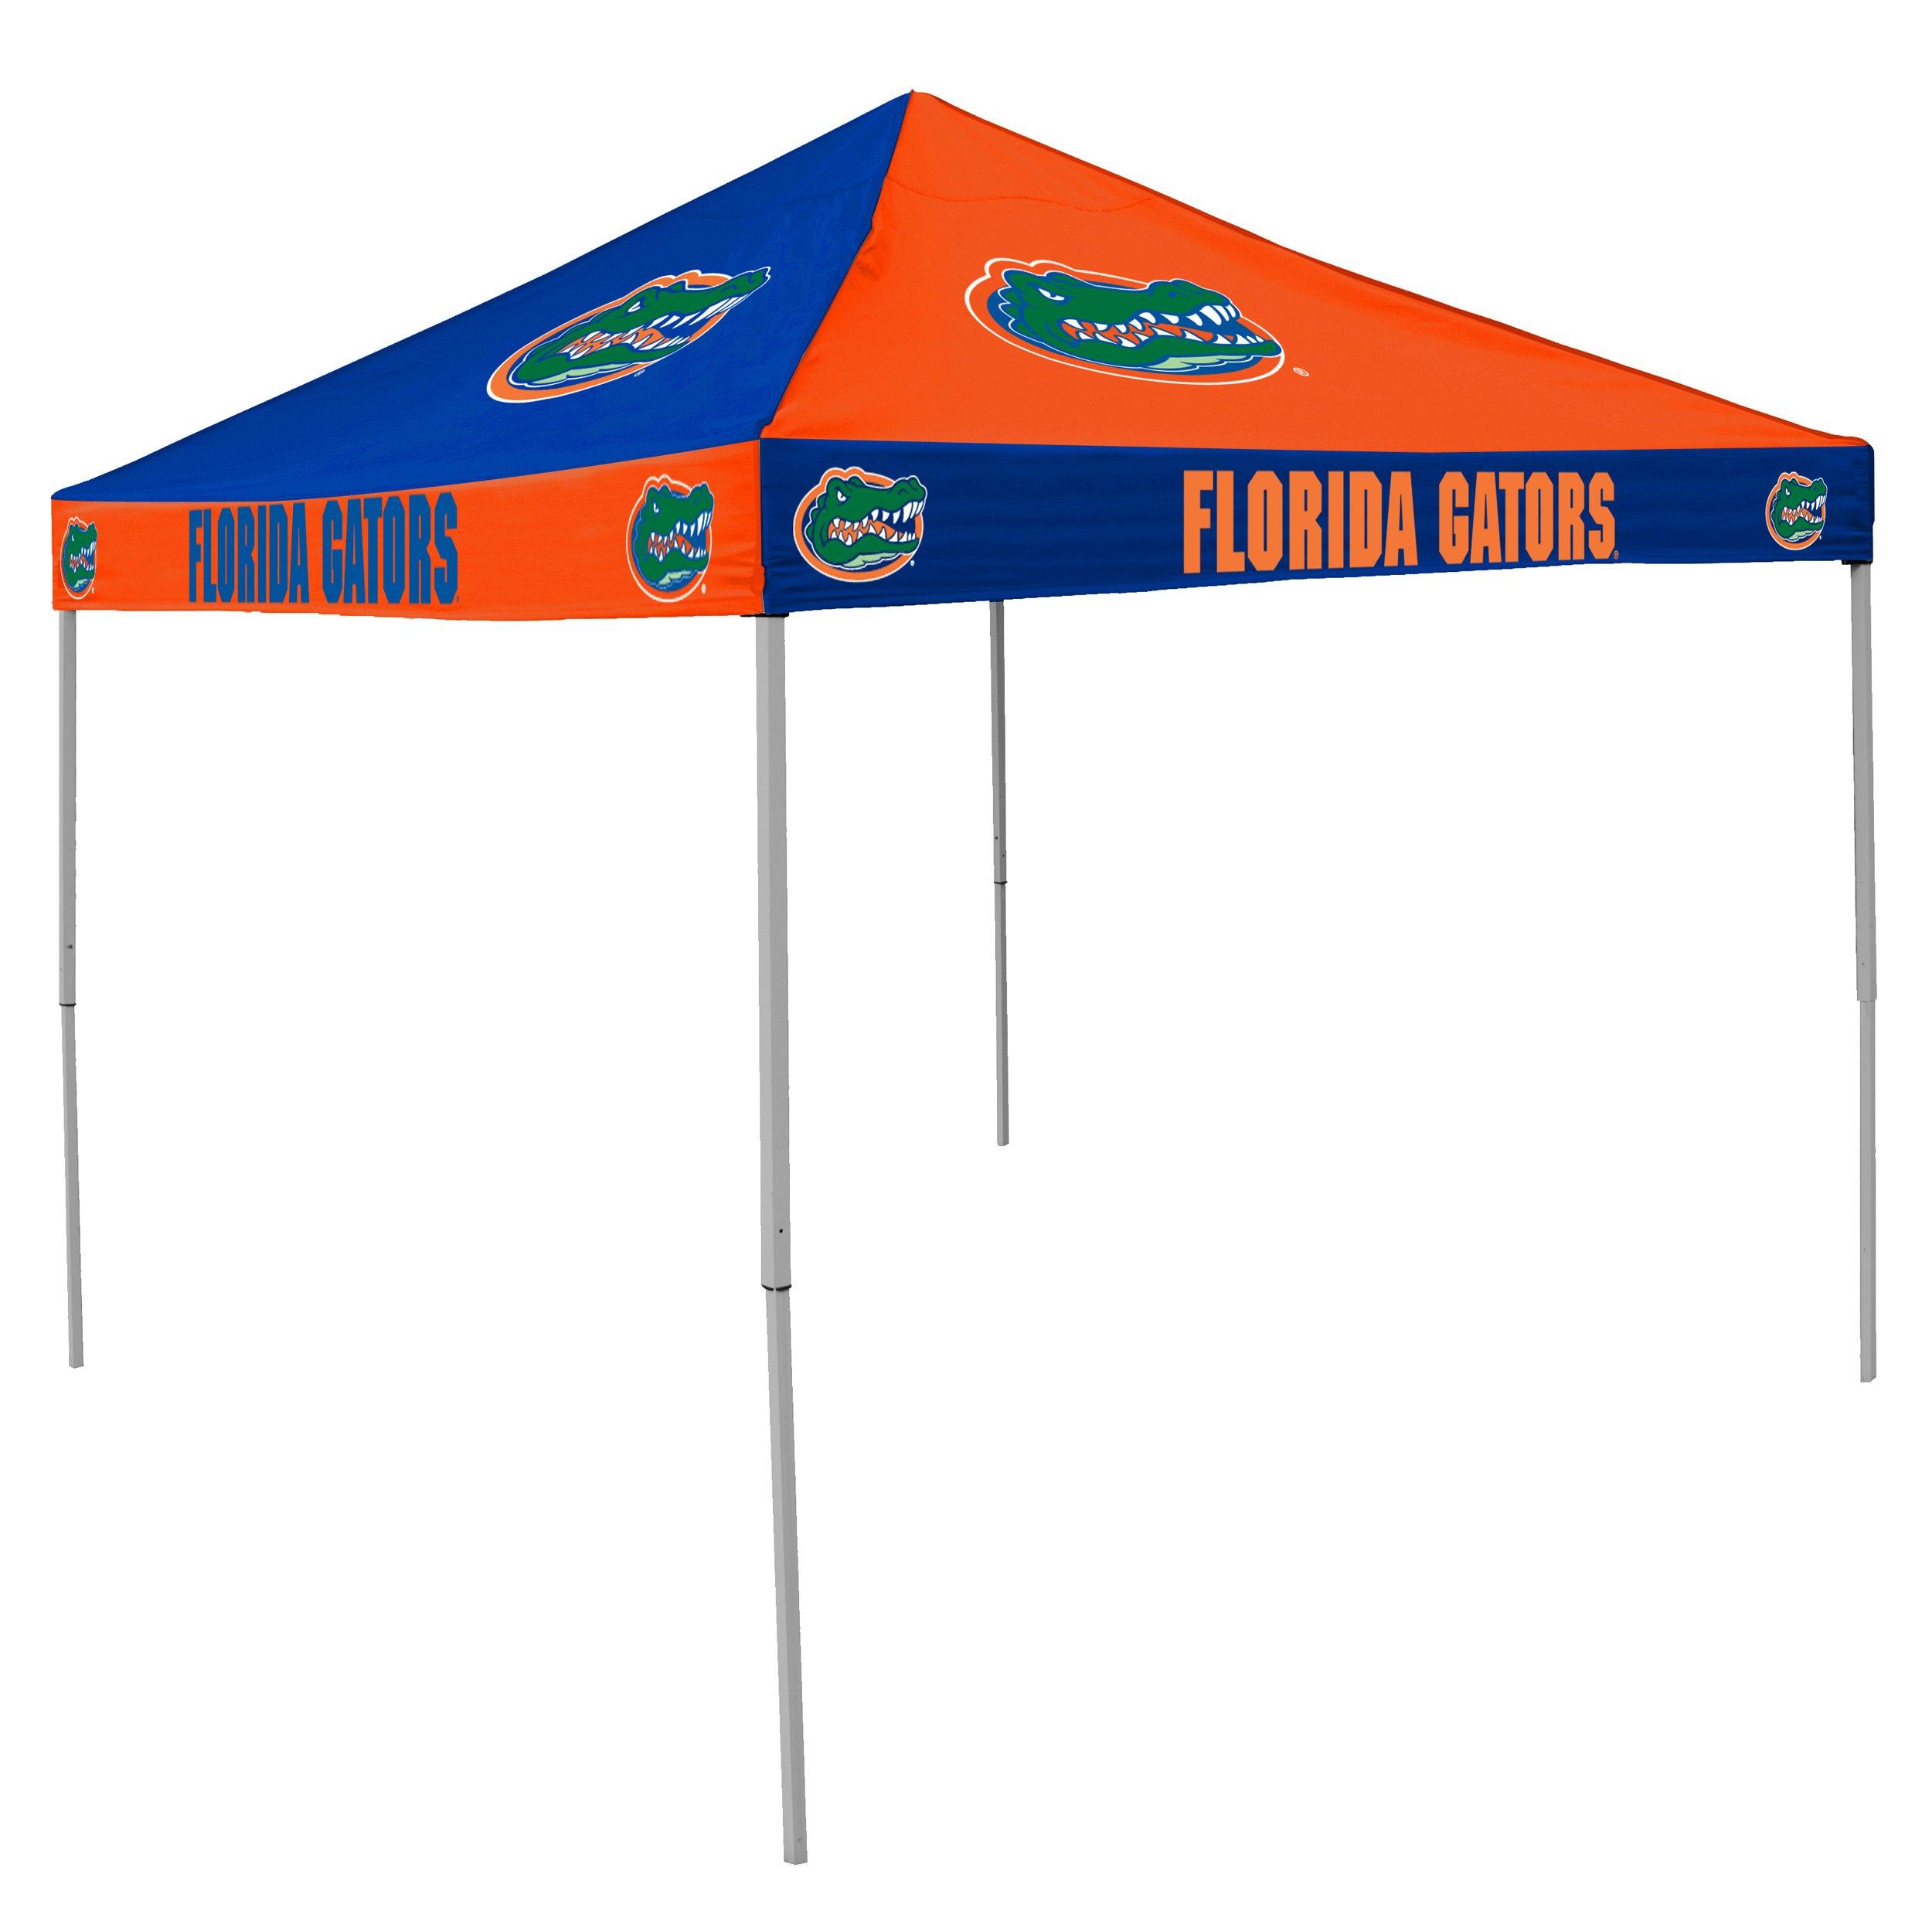 NCAA Florida Gators 9-Foot x 9-Foot Pinwheel Tailgating Canopy, Orange/Blue by Logo Brands